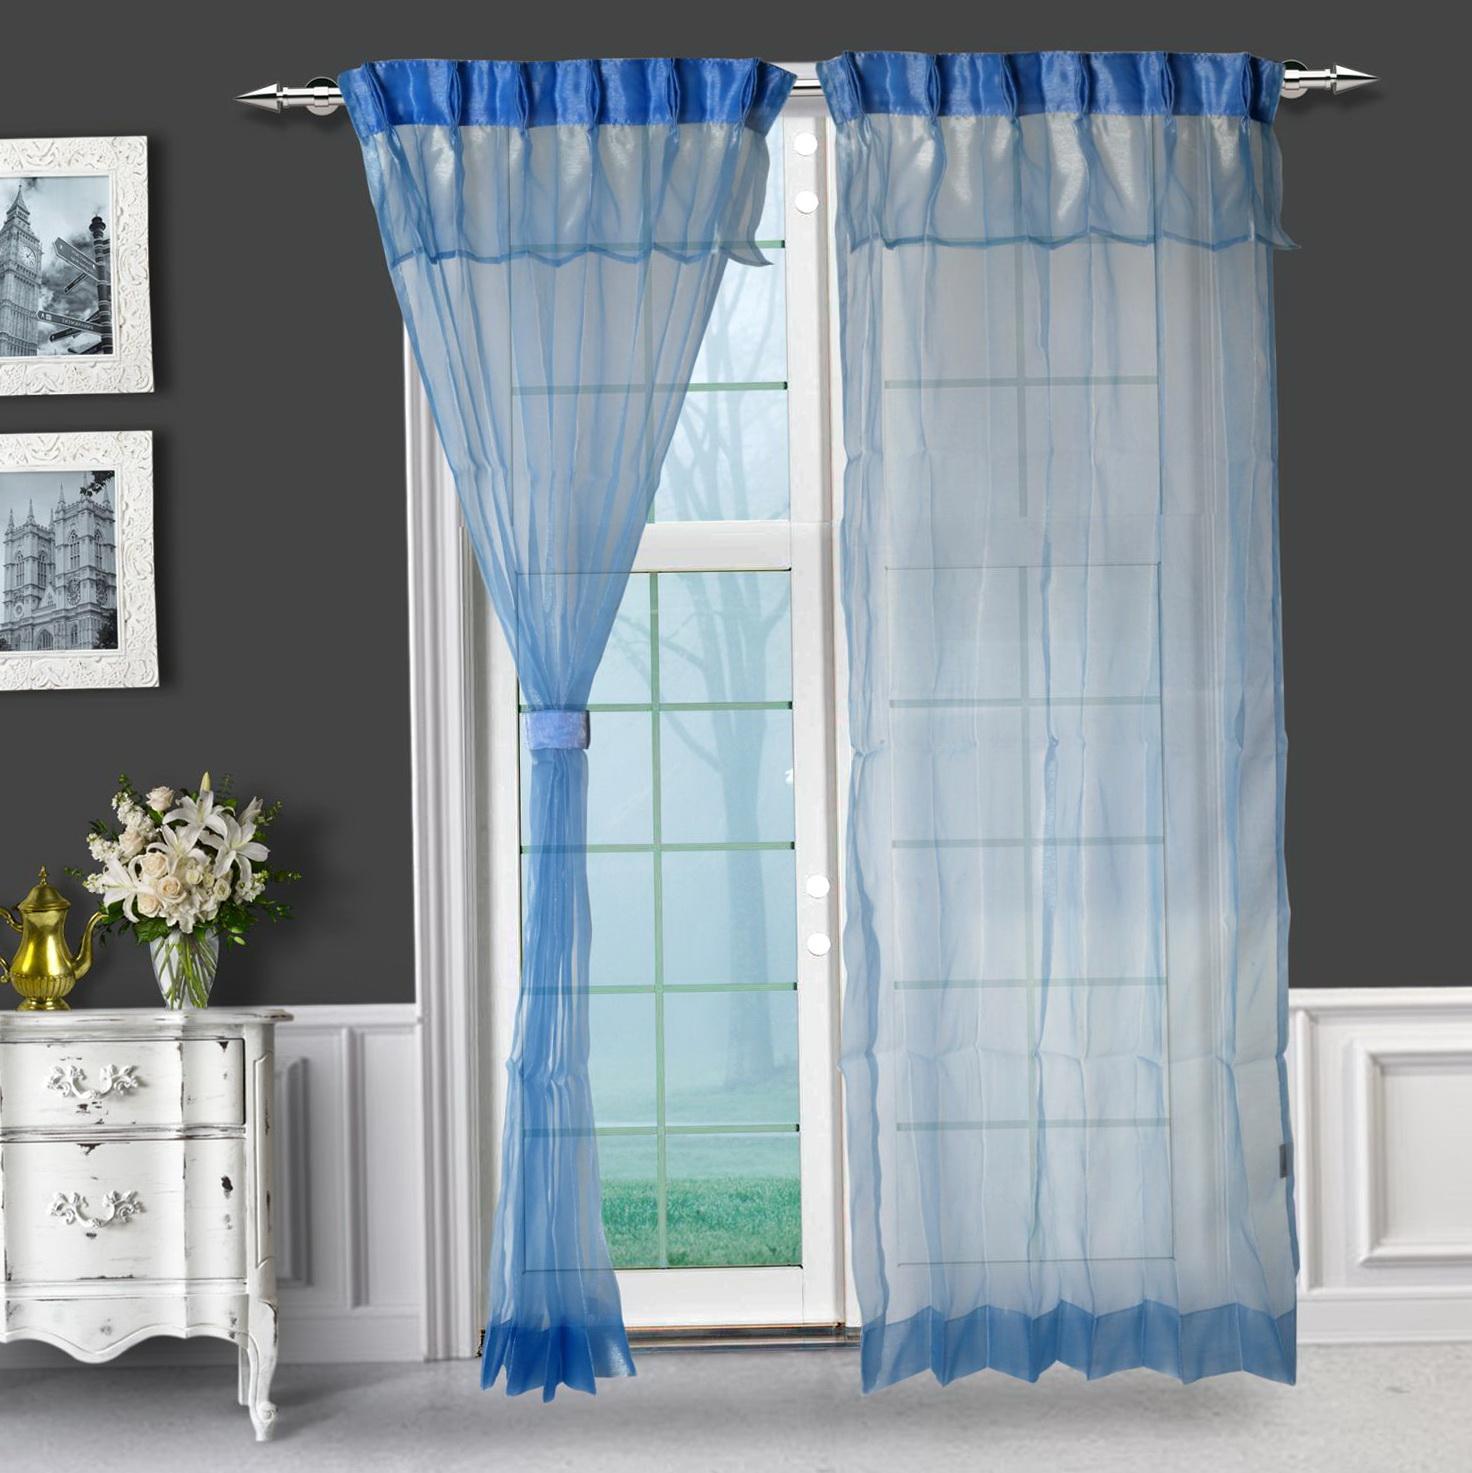 Buy Curtains Online Nz